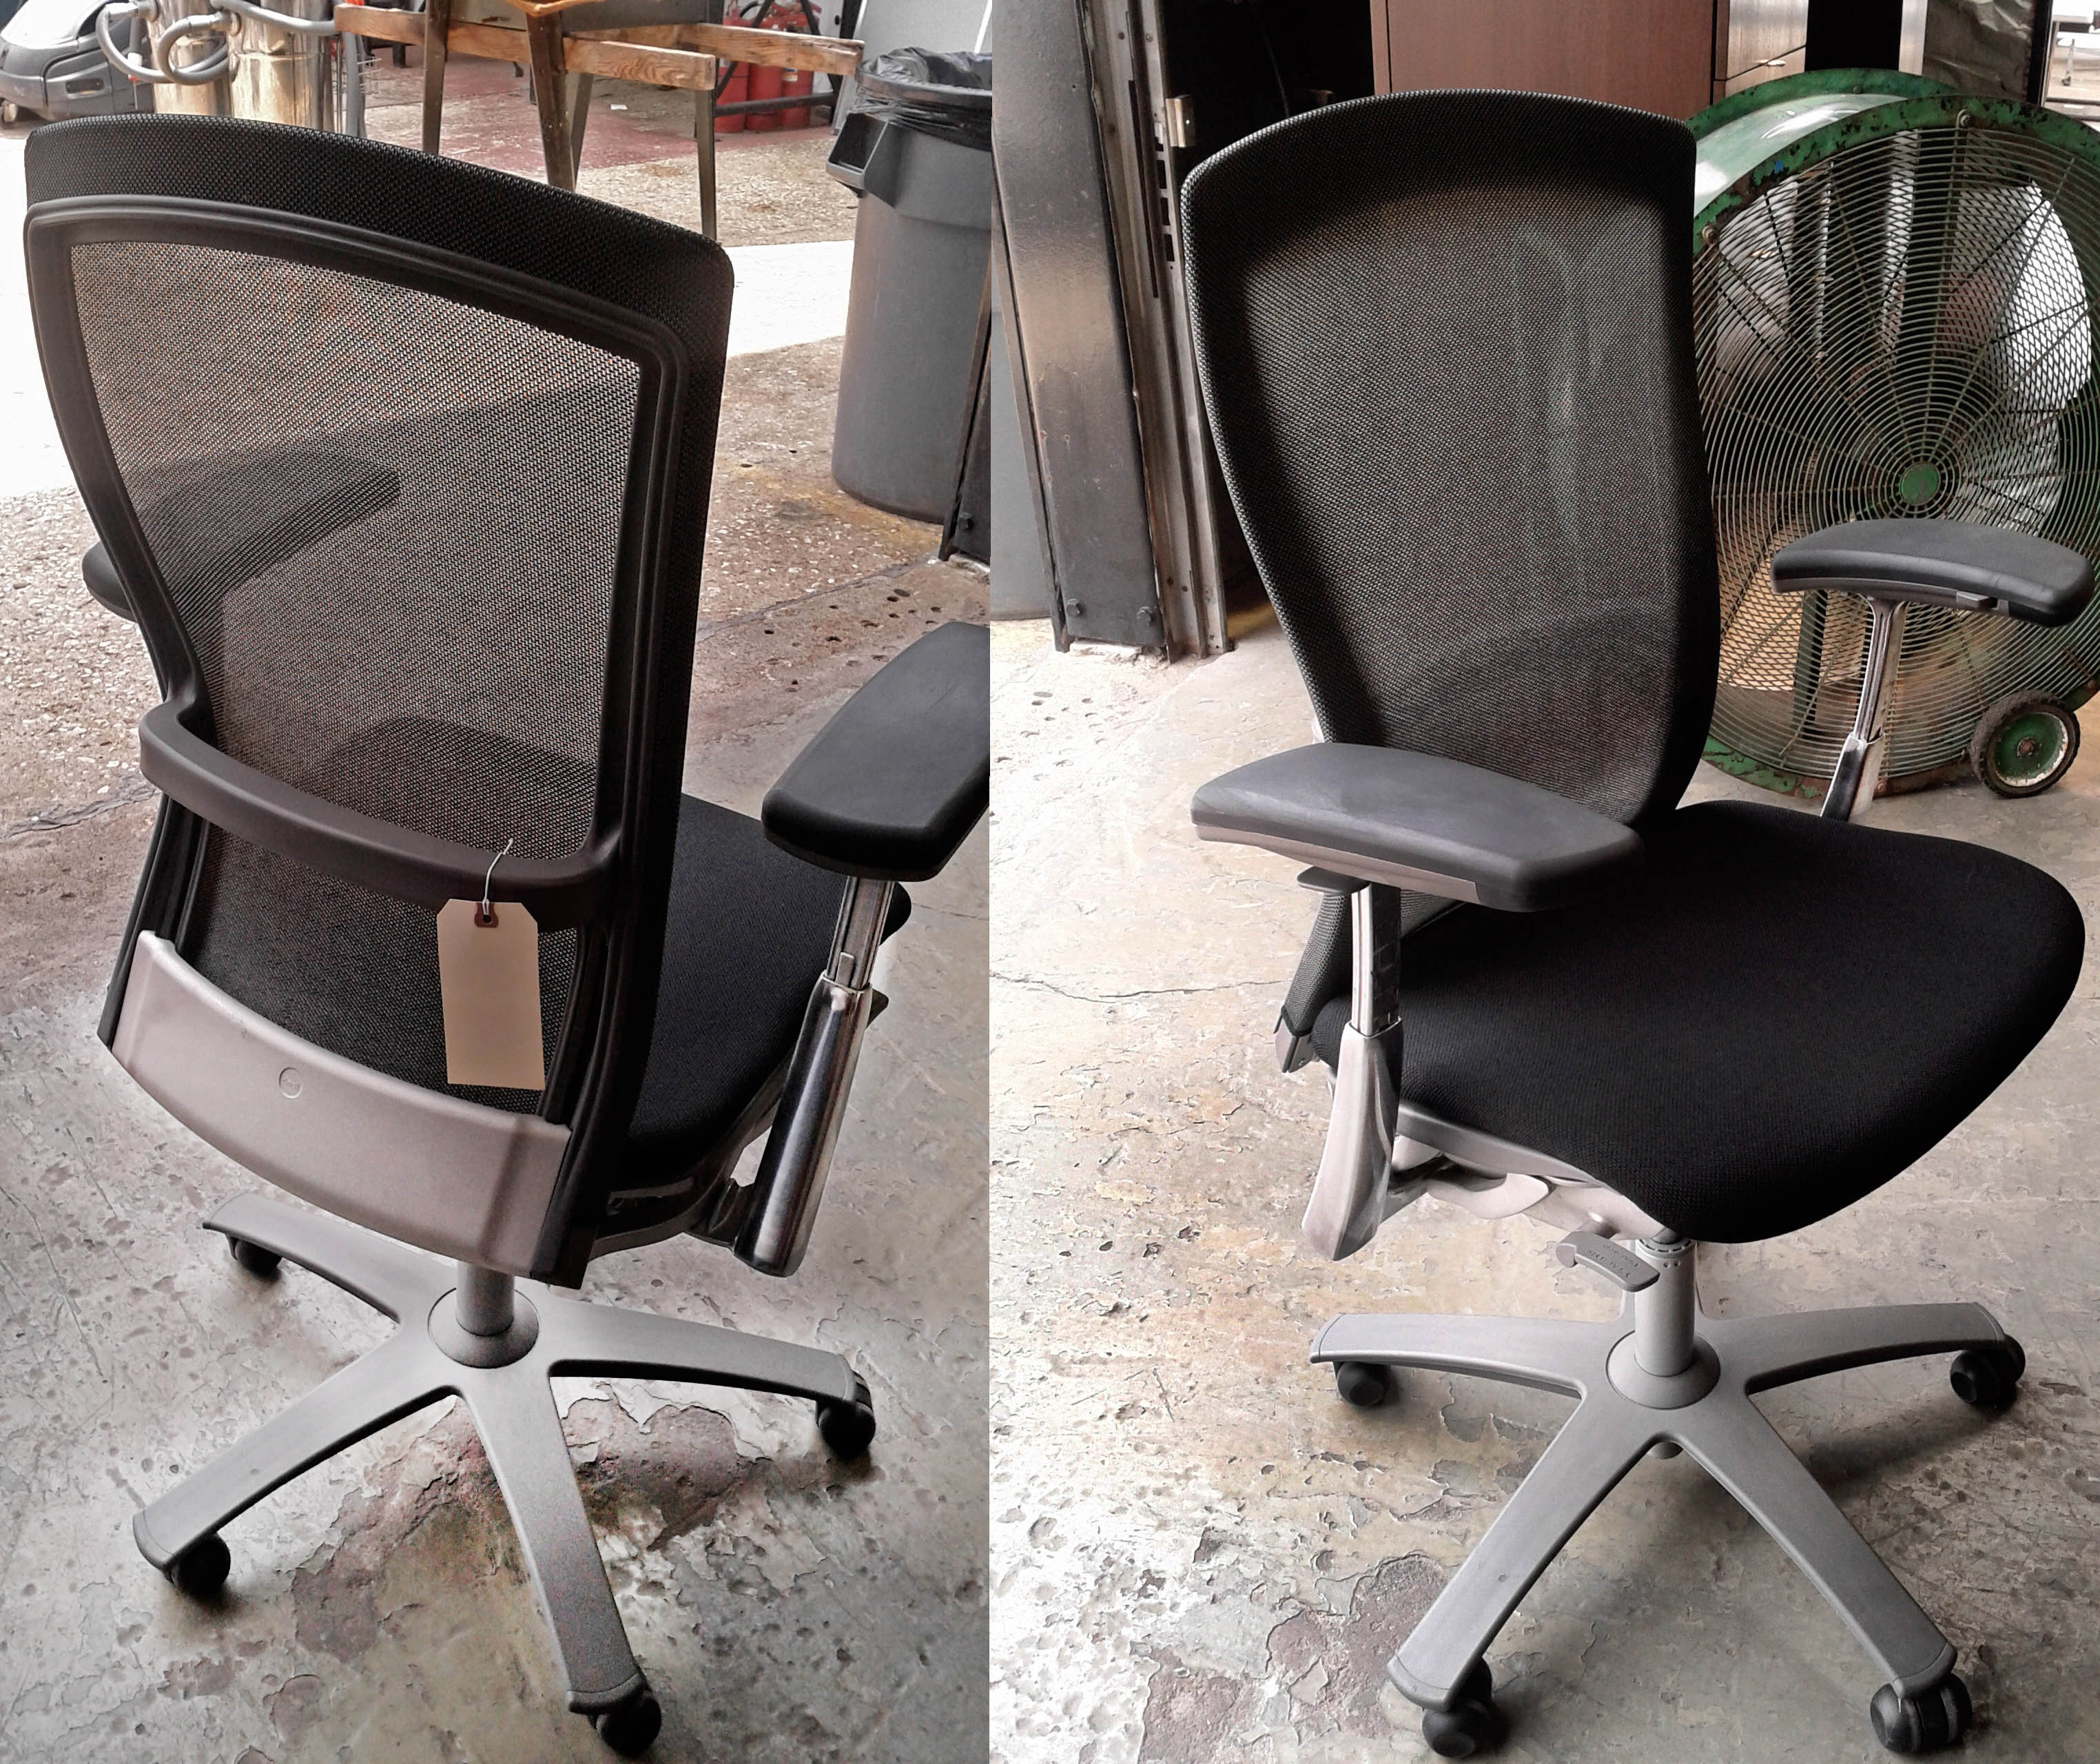 SAVVI mercial and fice Furniture